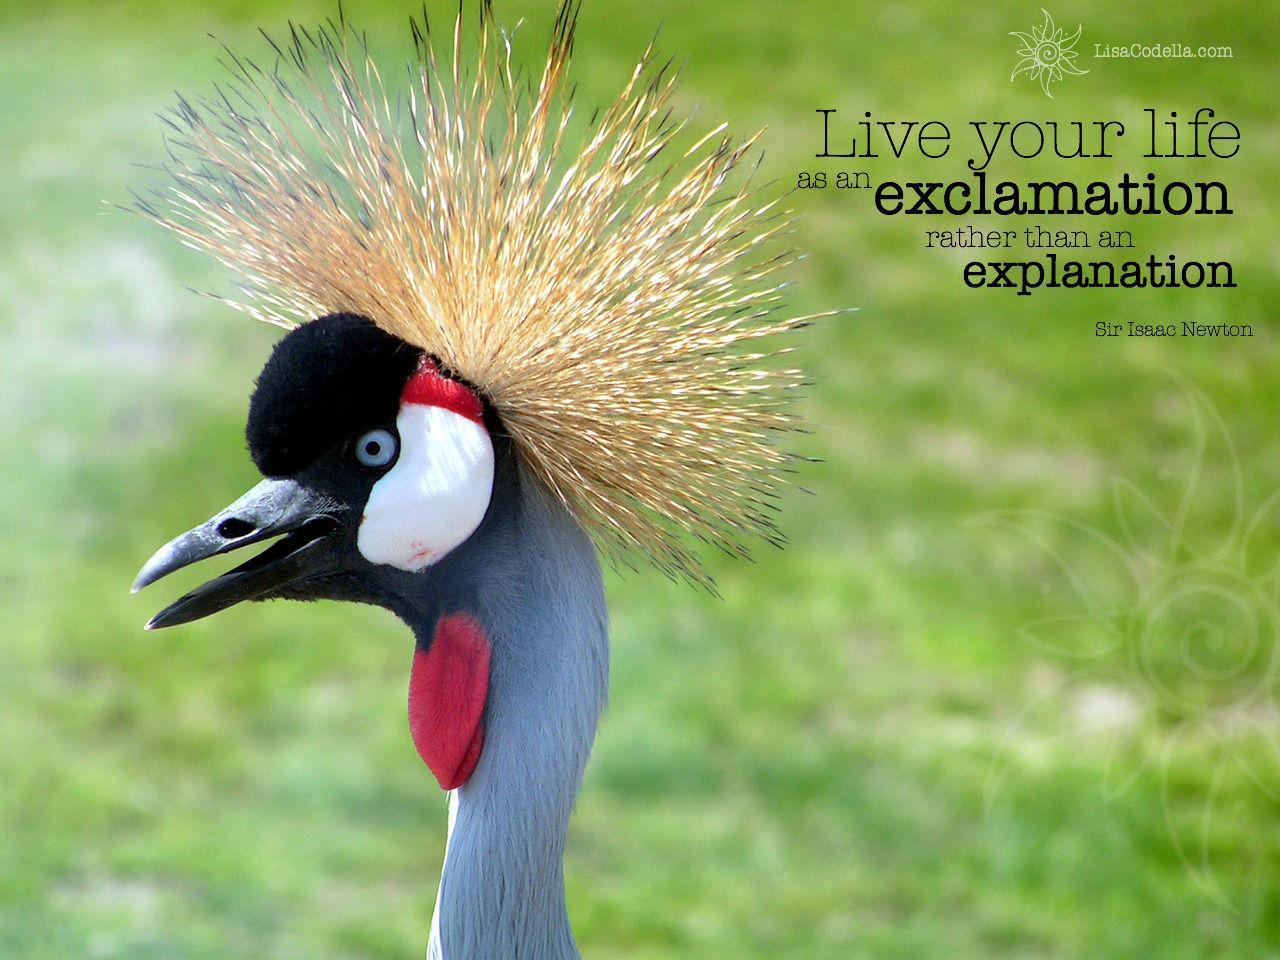 lisa-codella-independent-bird.jpg